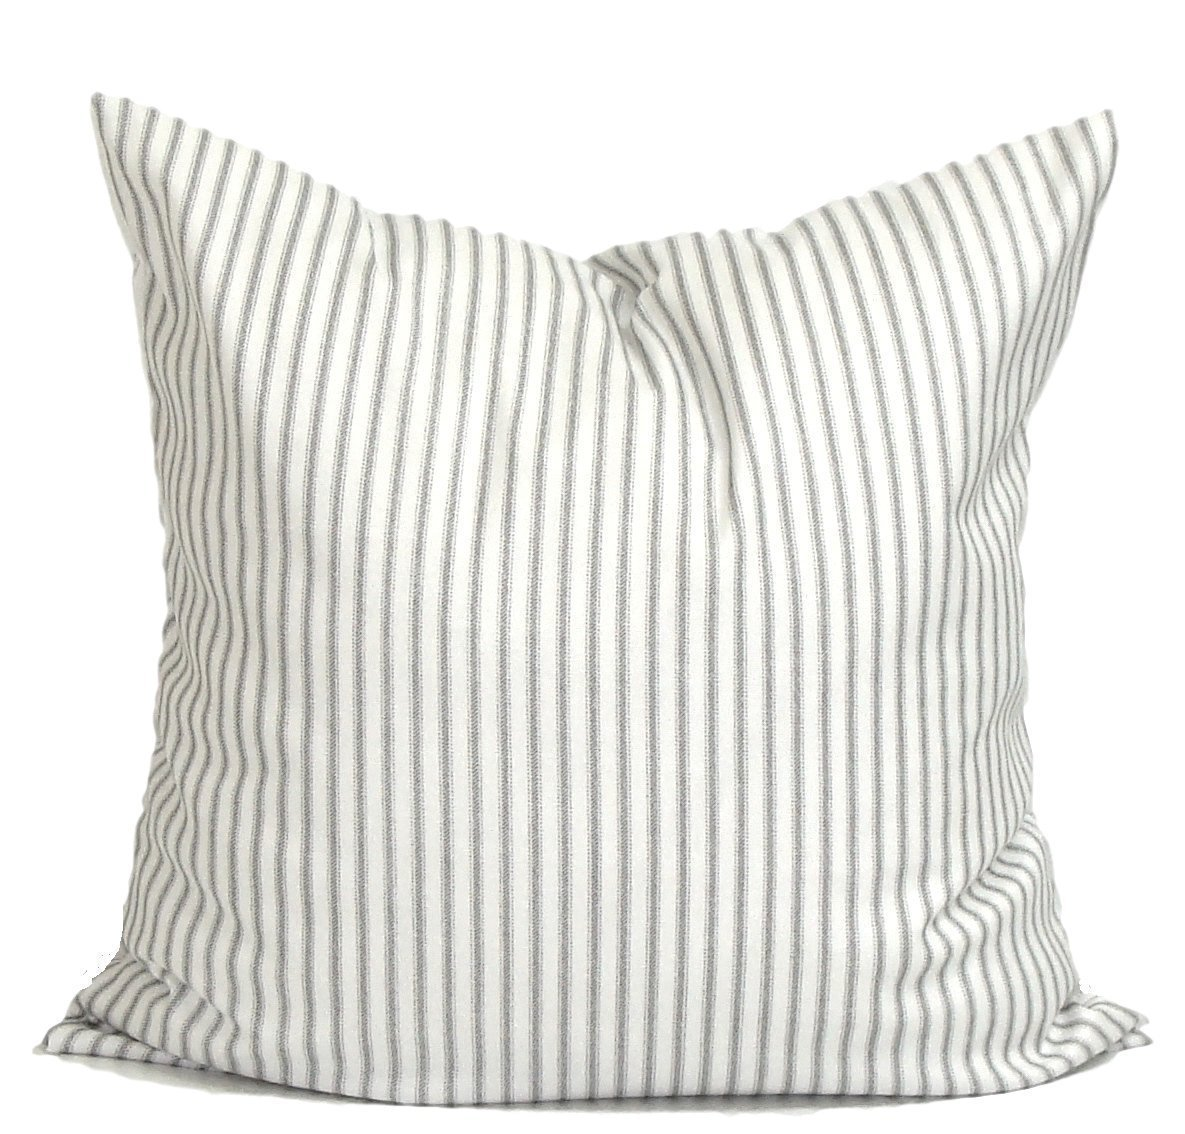 Gray Ticking Pillow Cover, Ticking Throw Pillow Cover, Decorative Pillow Cover, Ticking Stripe Throw Pillow, Farmhouse Pillow, Any Size, Gray Ticking Pillow, Grey Stripe Pillow.Farmhouse Pillow Covers